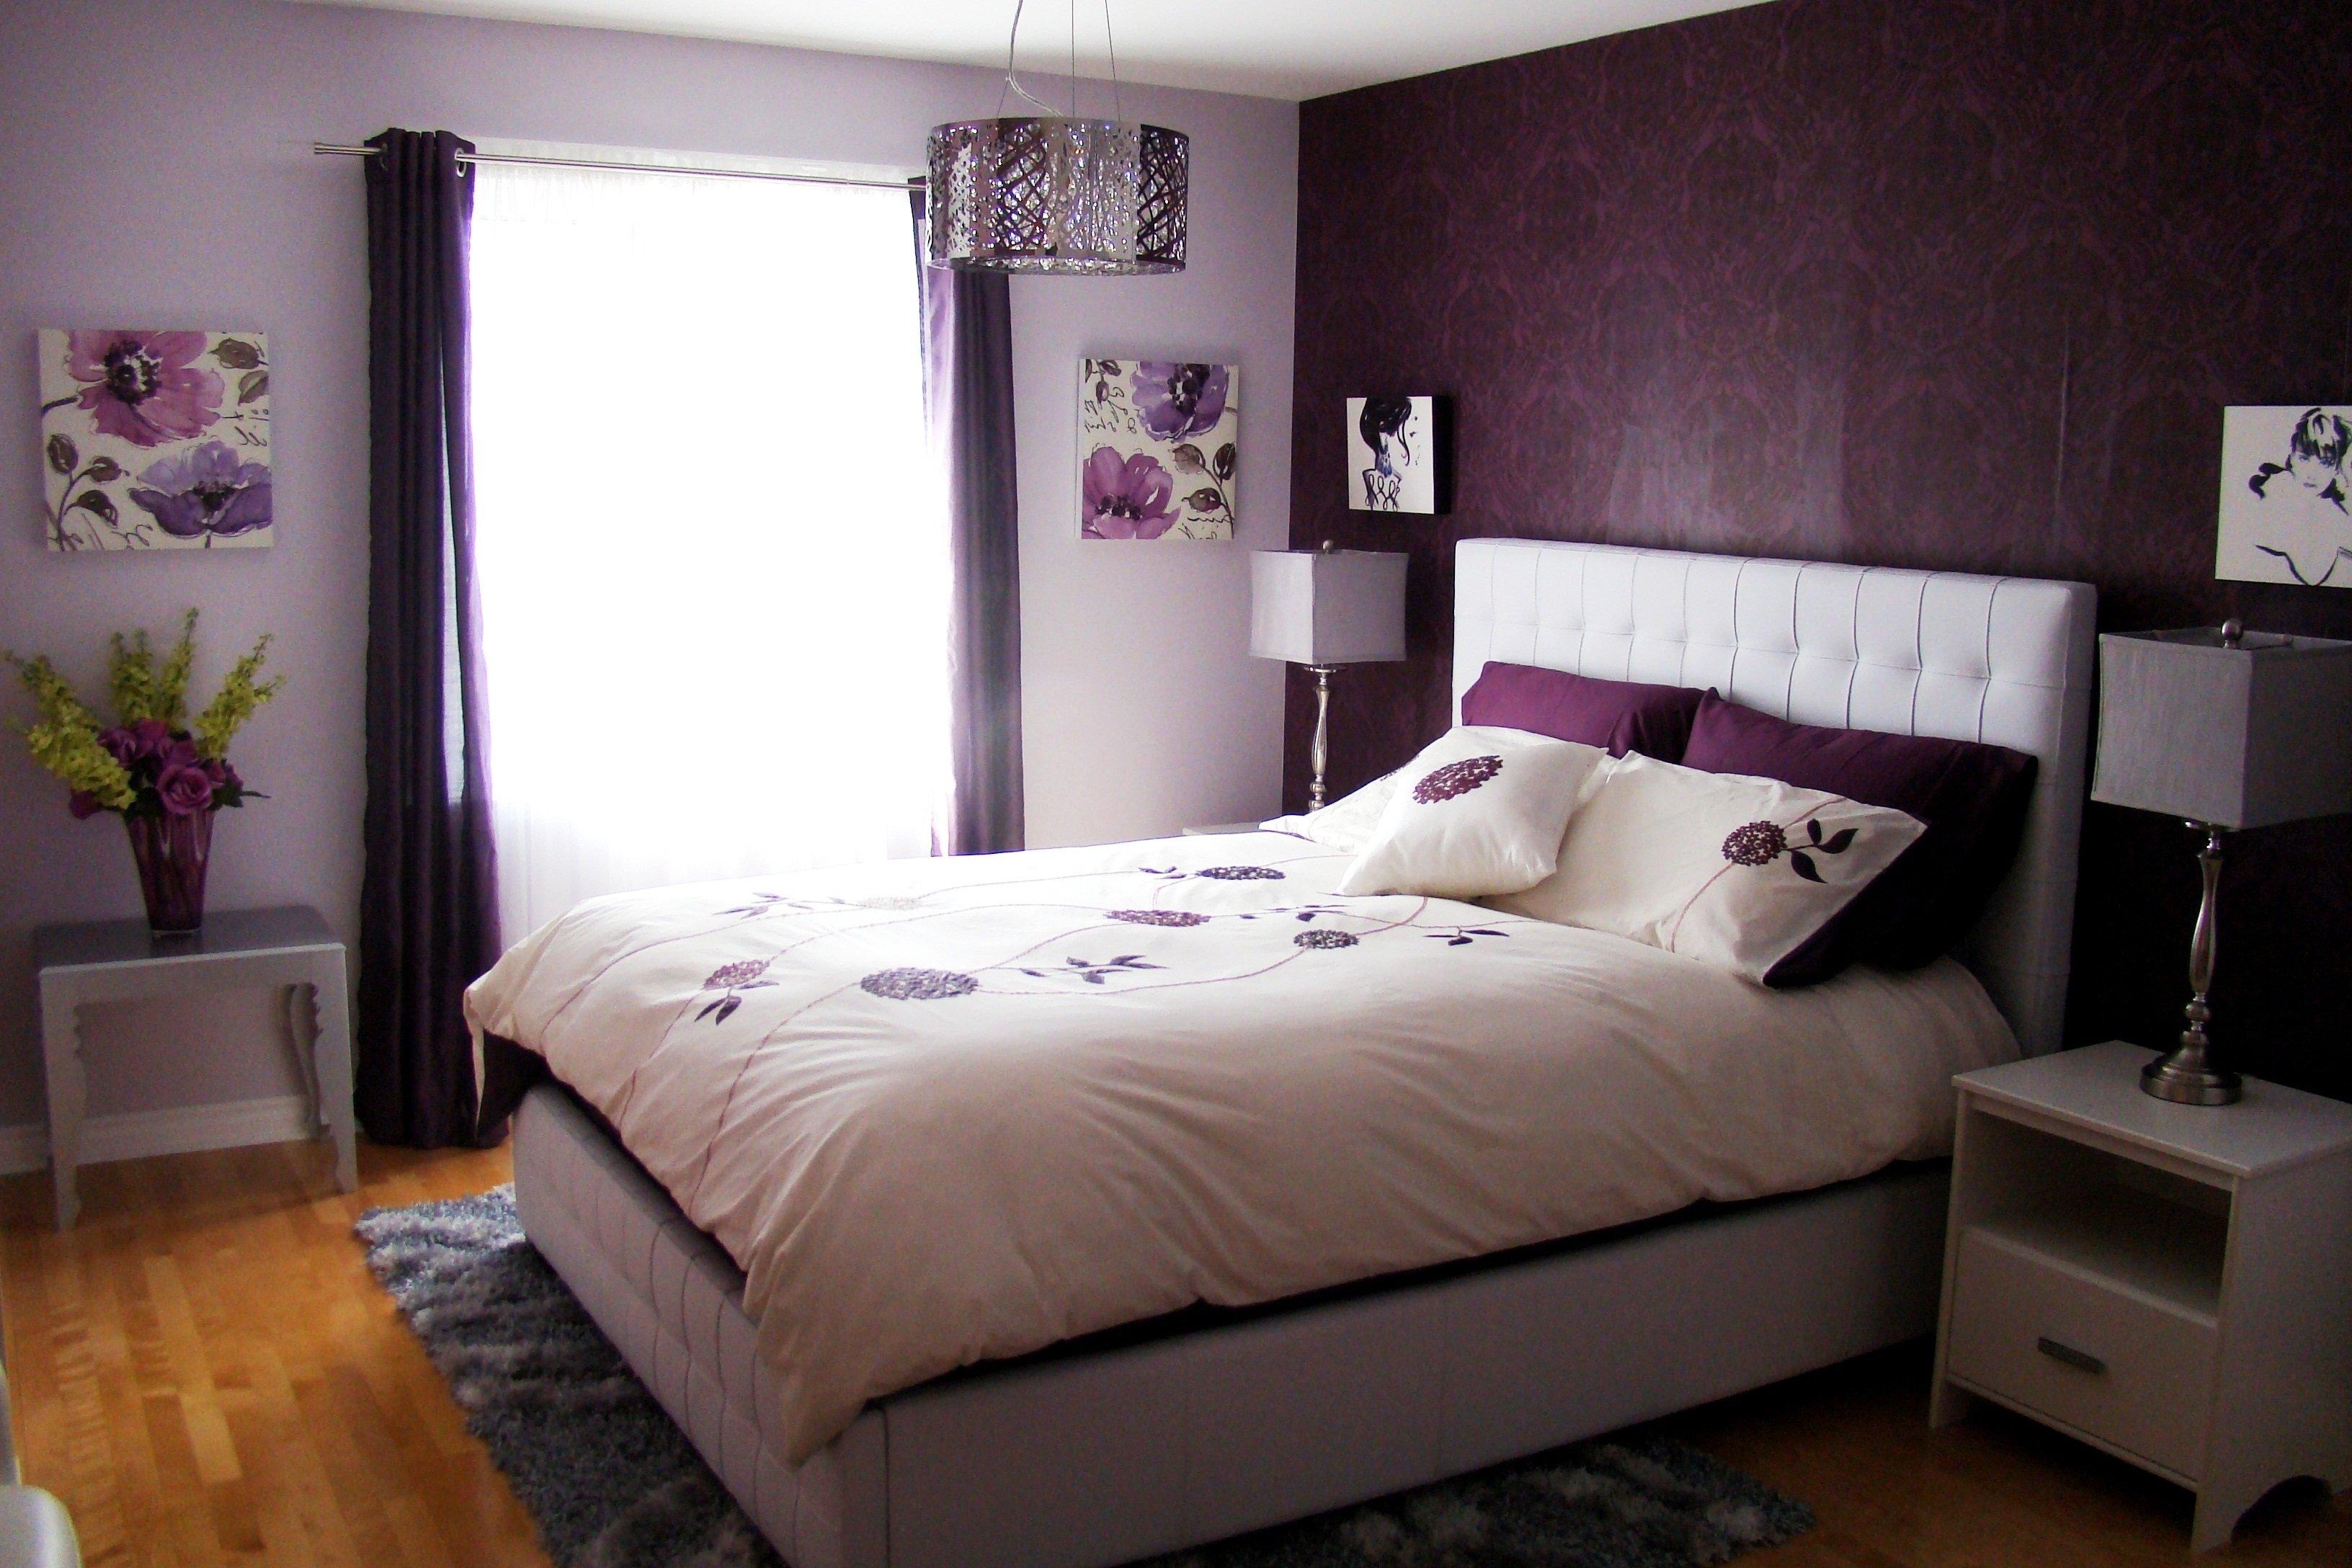 10 Lovely Gray And Purple Bedroom Ideas astonishing purple bedroom ideas in grey purple bedroom gray purple